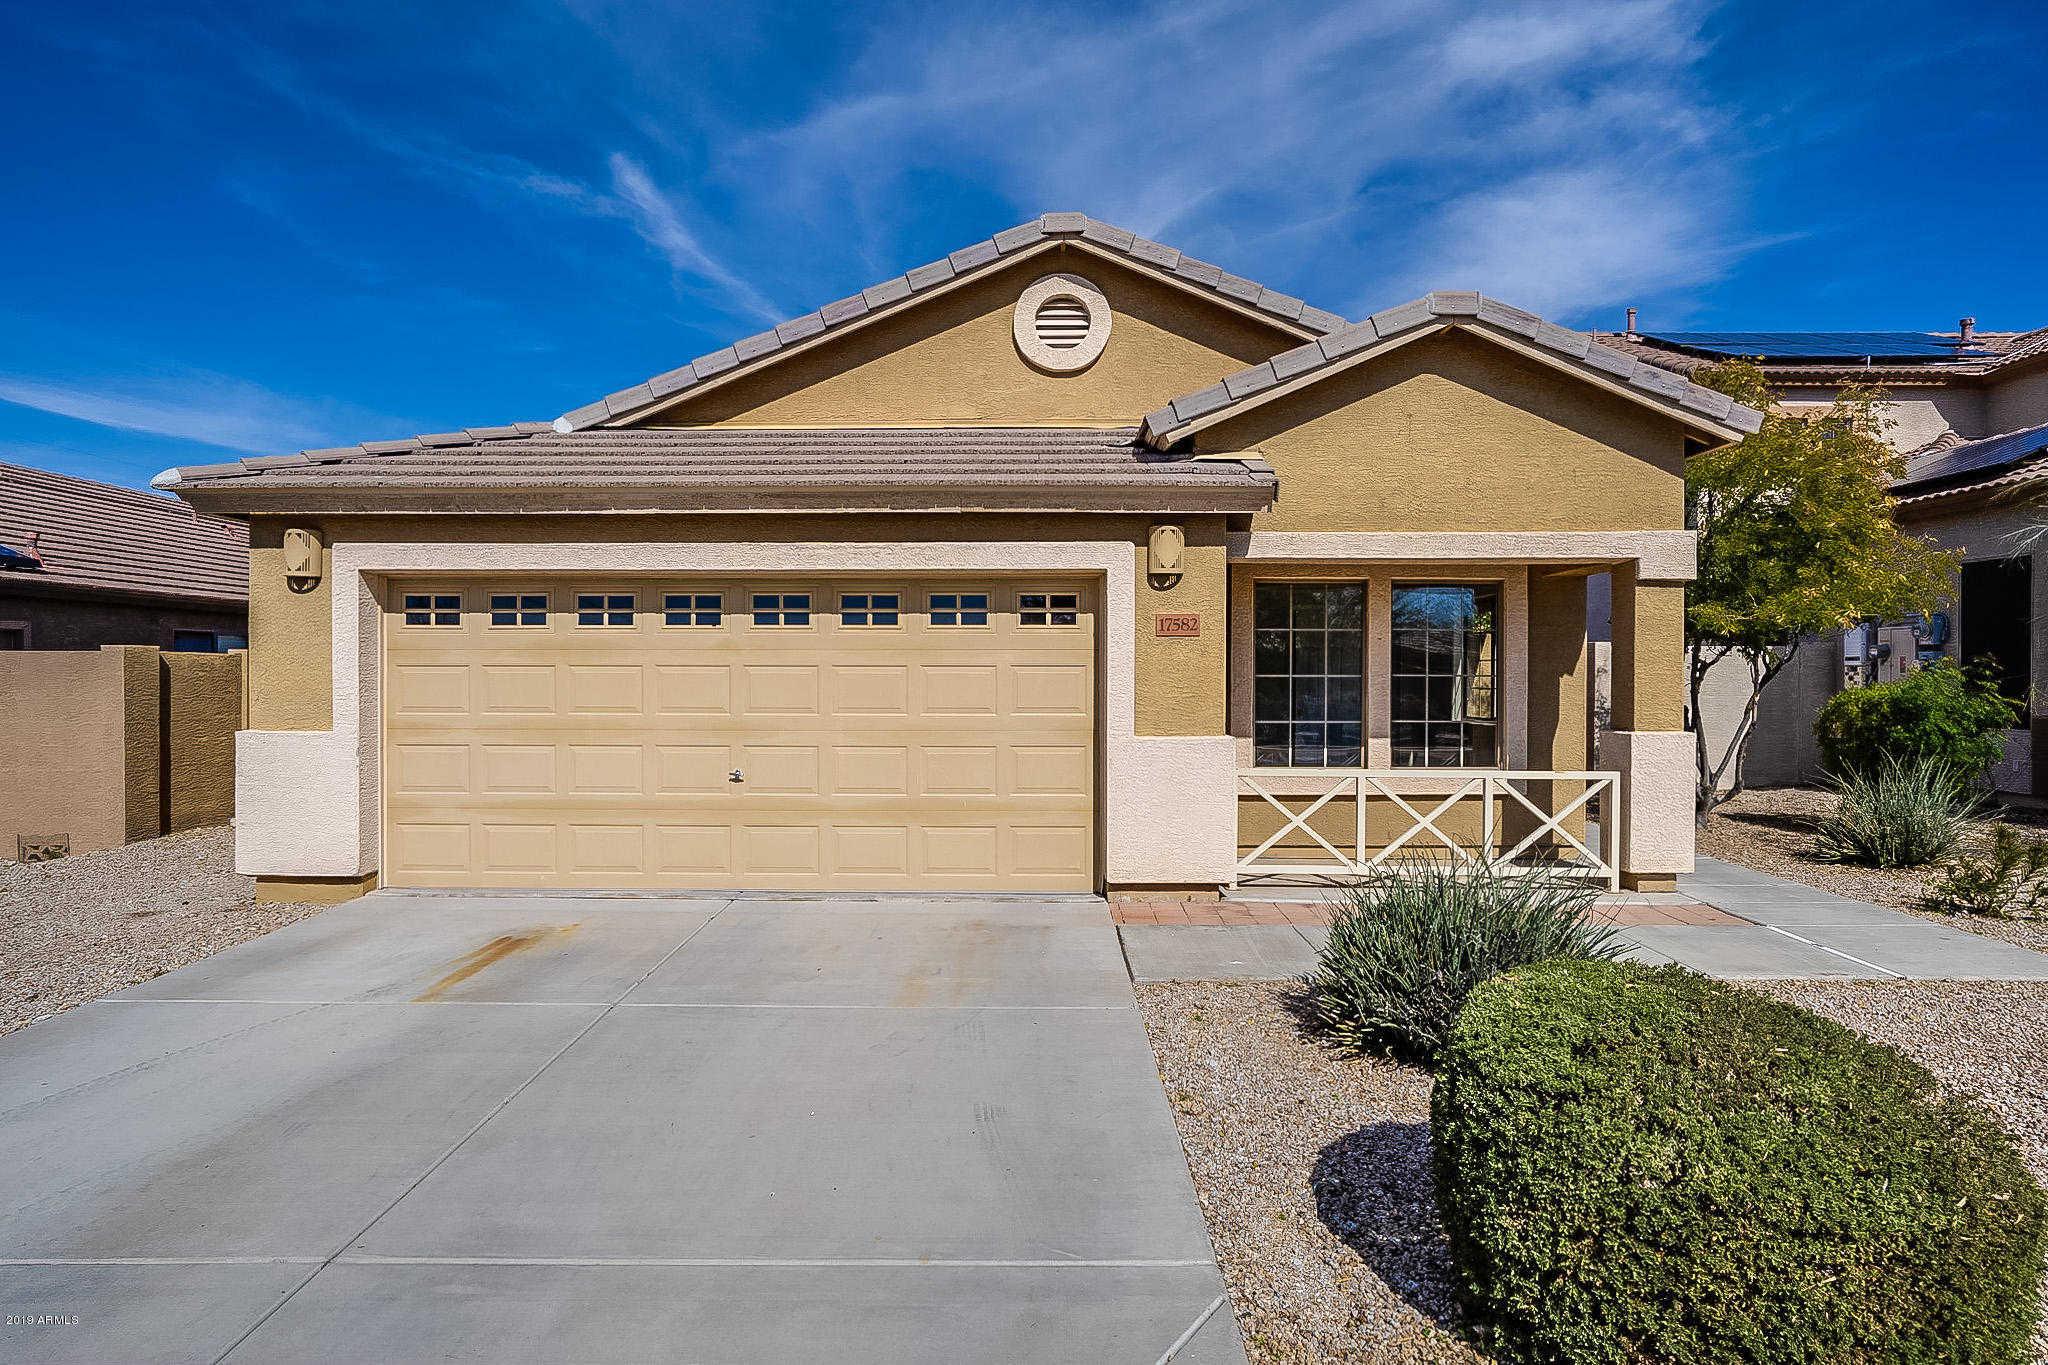 $245,000 - 4Br/2Ba - Home for Sale in Estrella Mountain Ranch Parcel 26, Goodyear